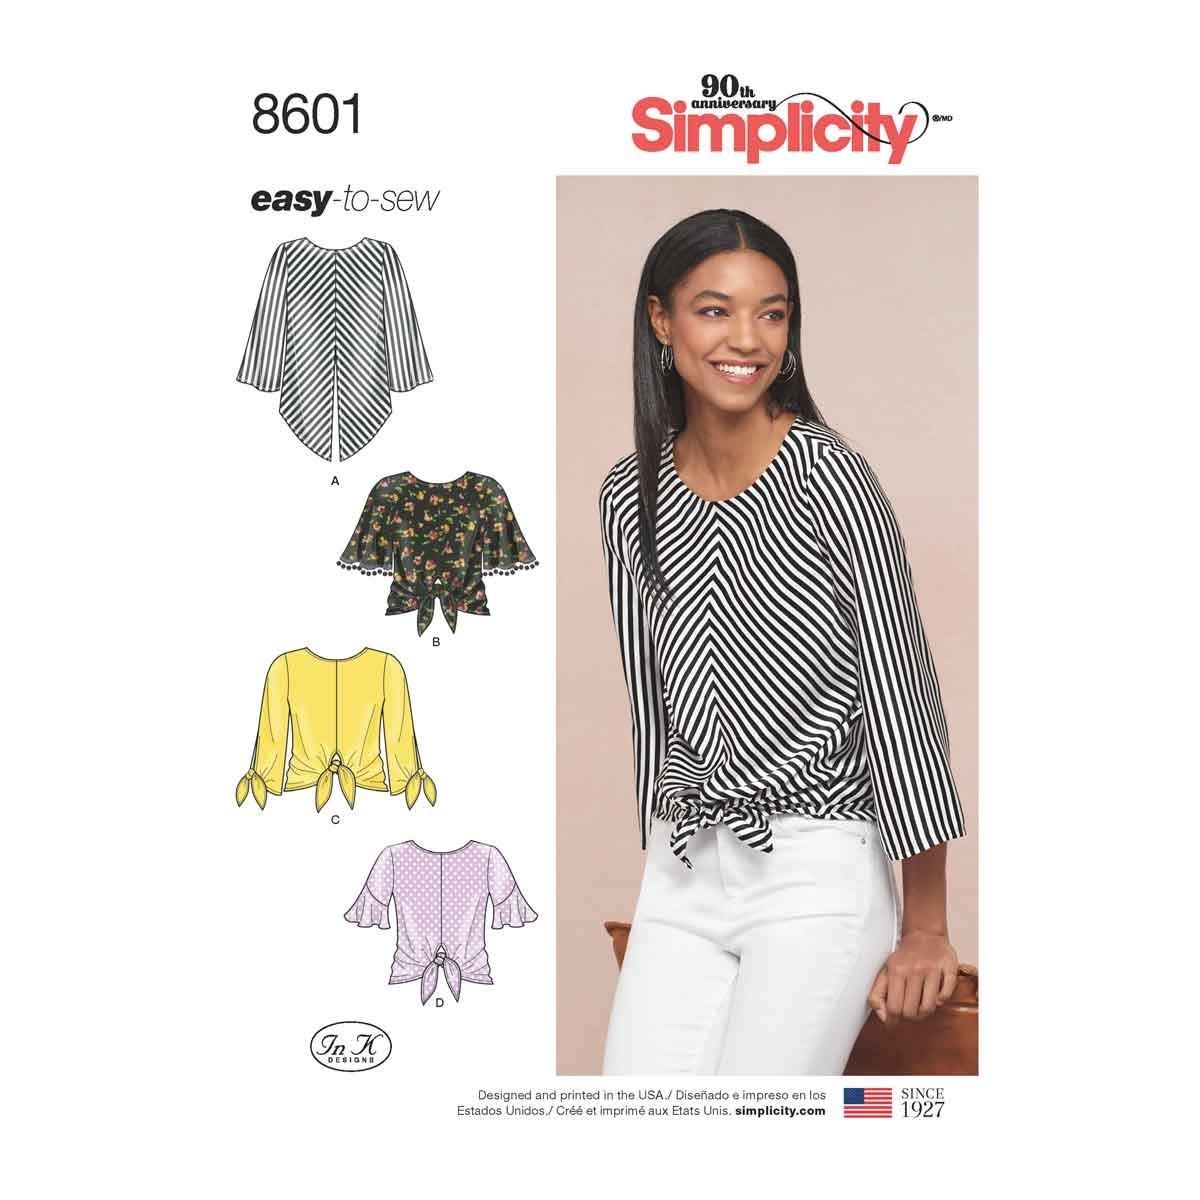 Simplicity pattern 8601